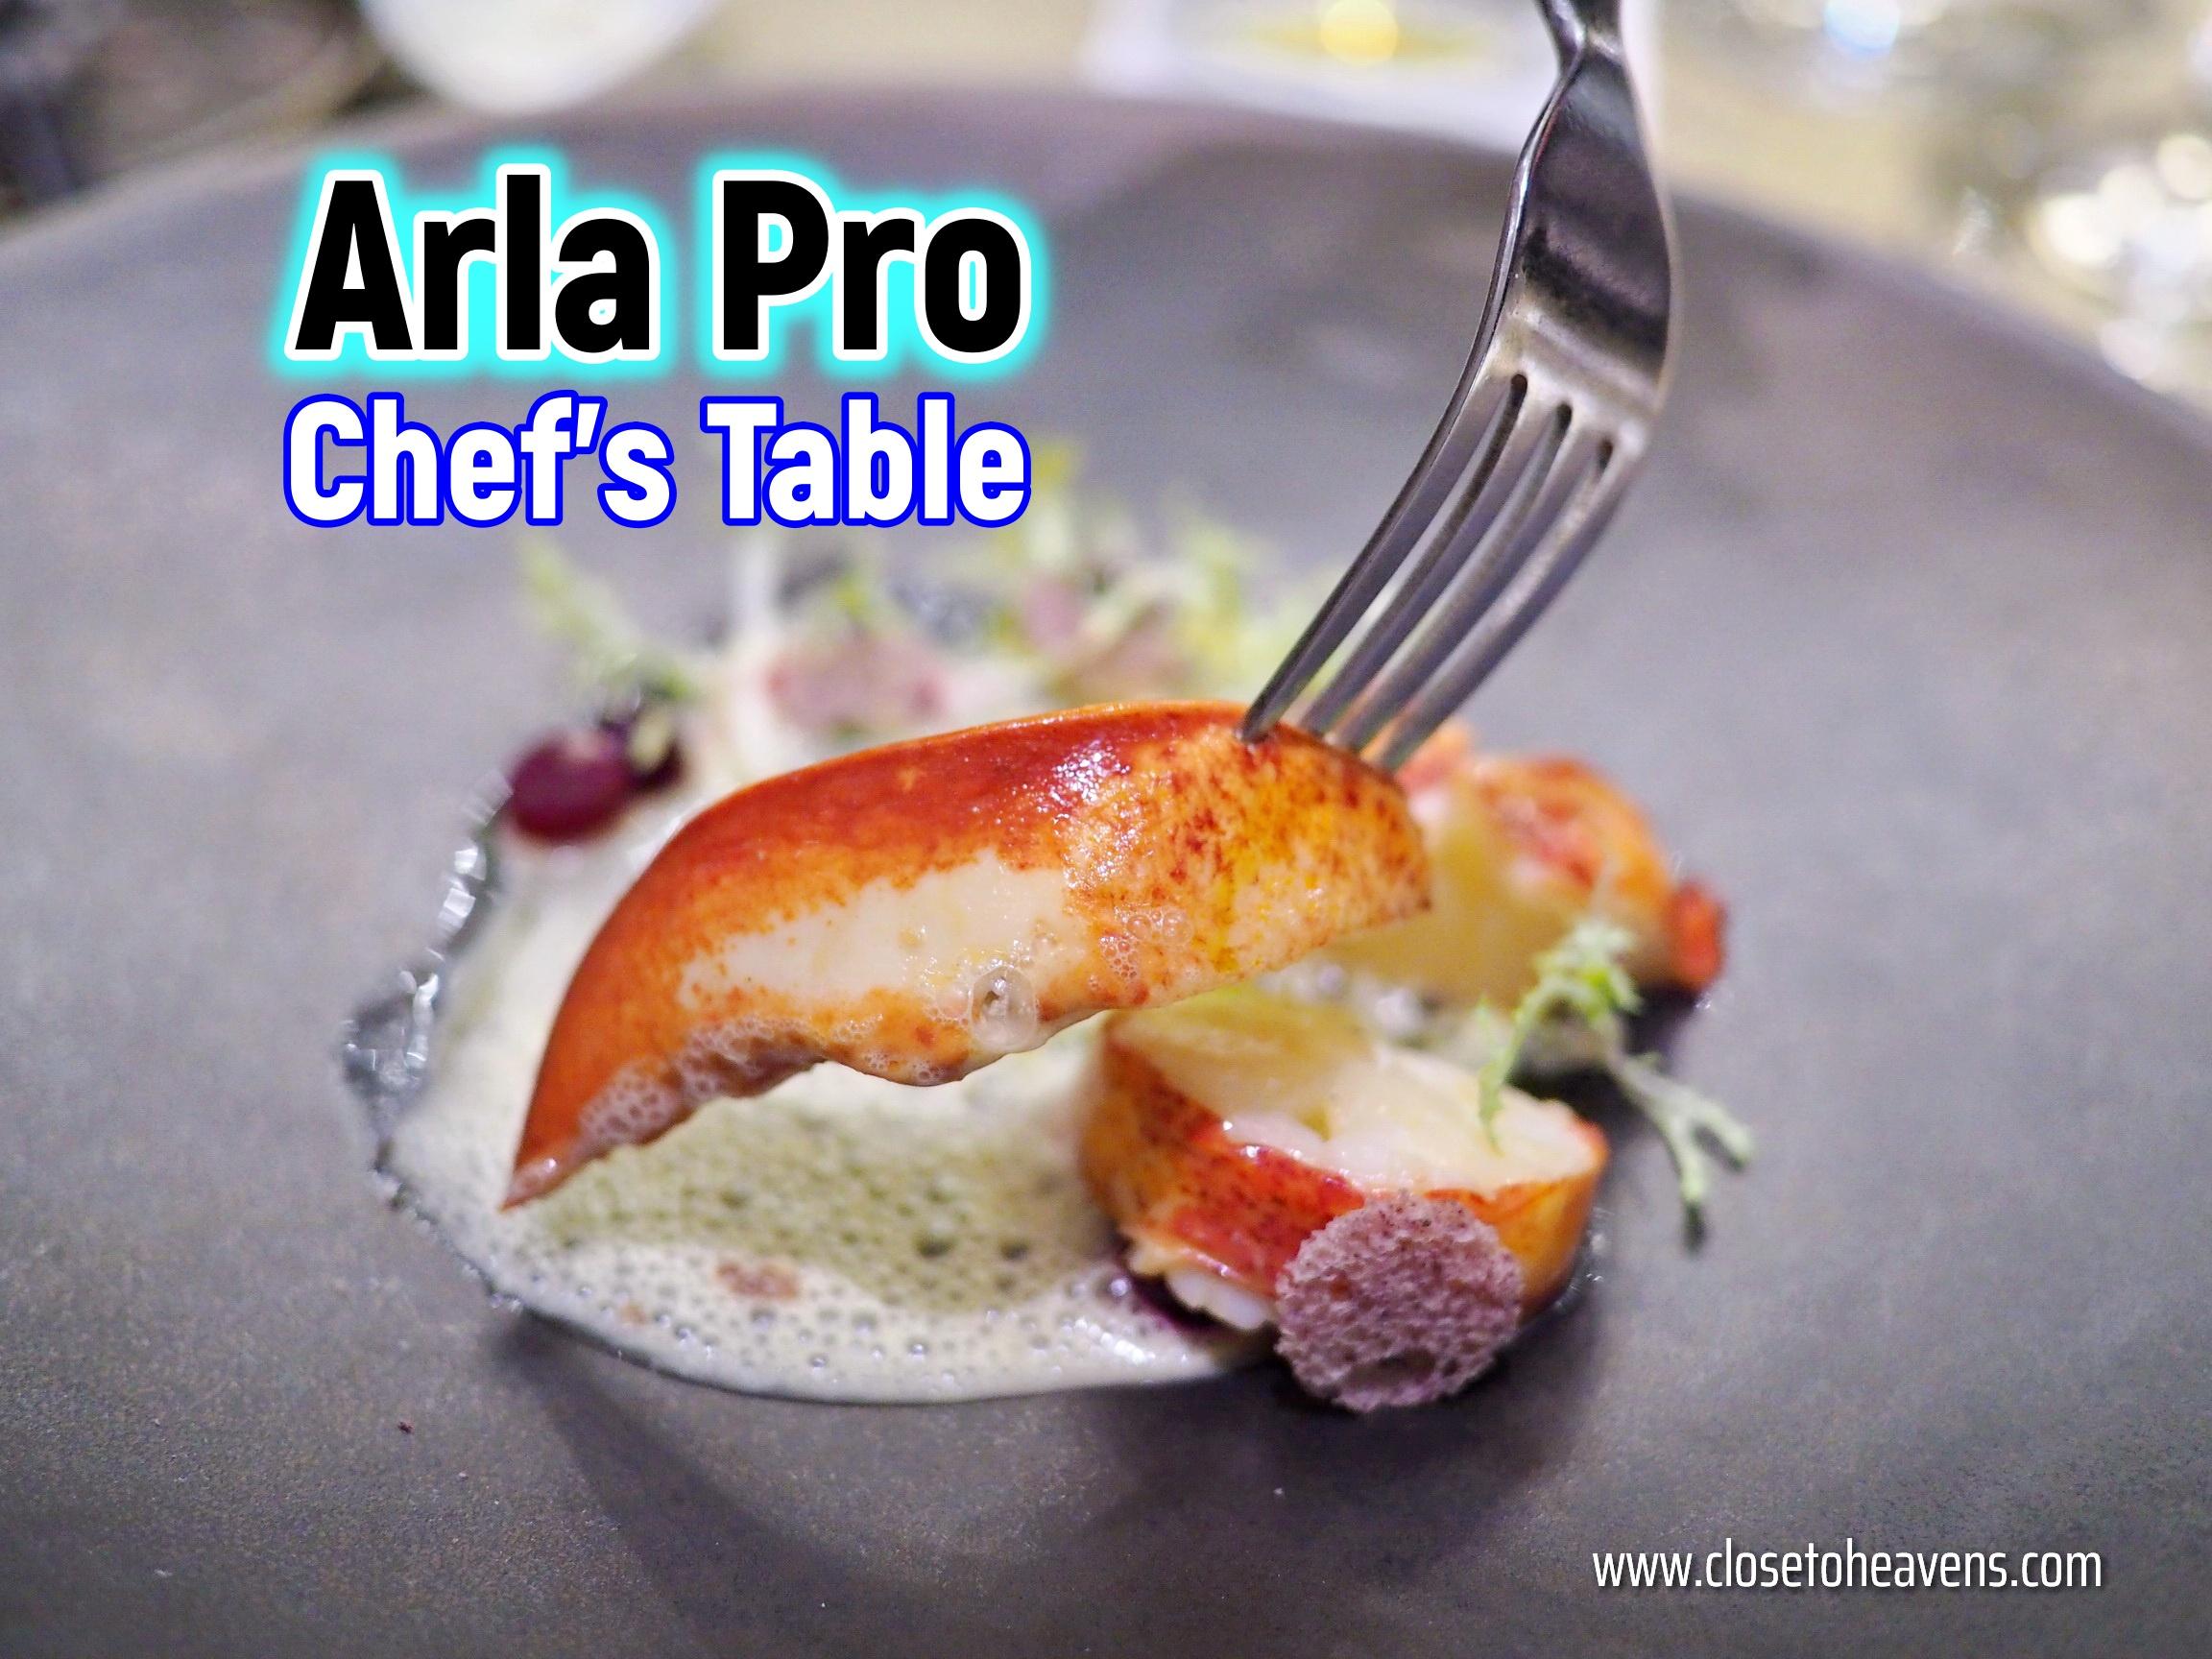 Arlo Pro Chef's Table 2019